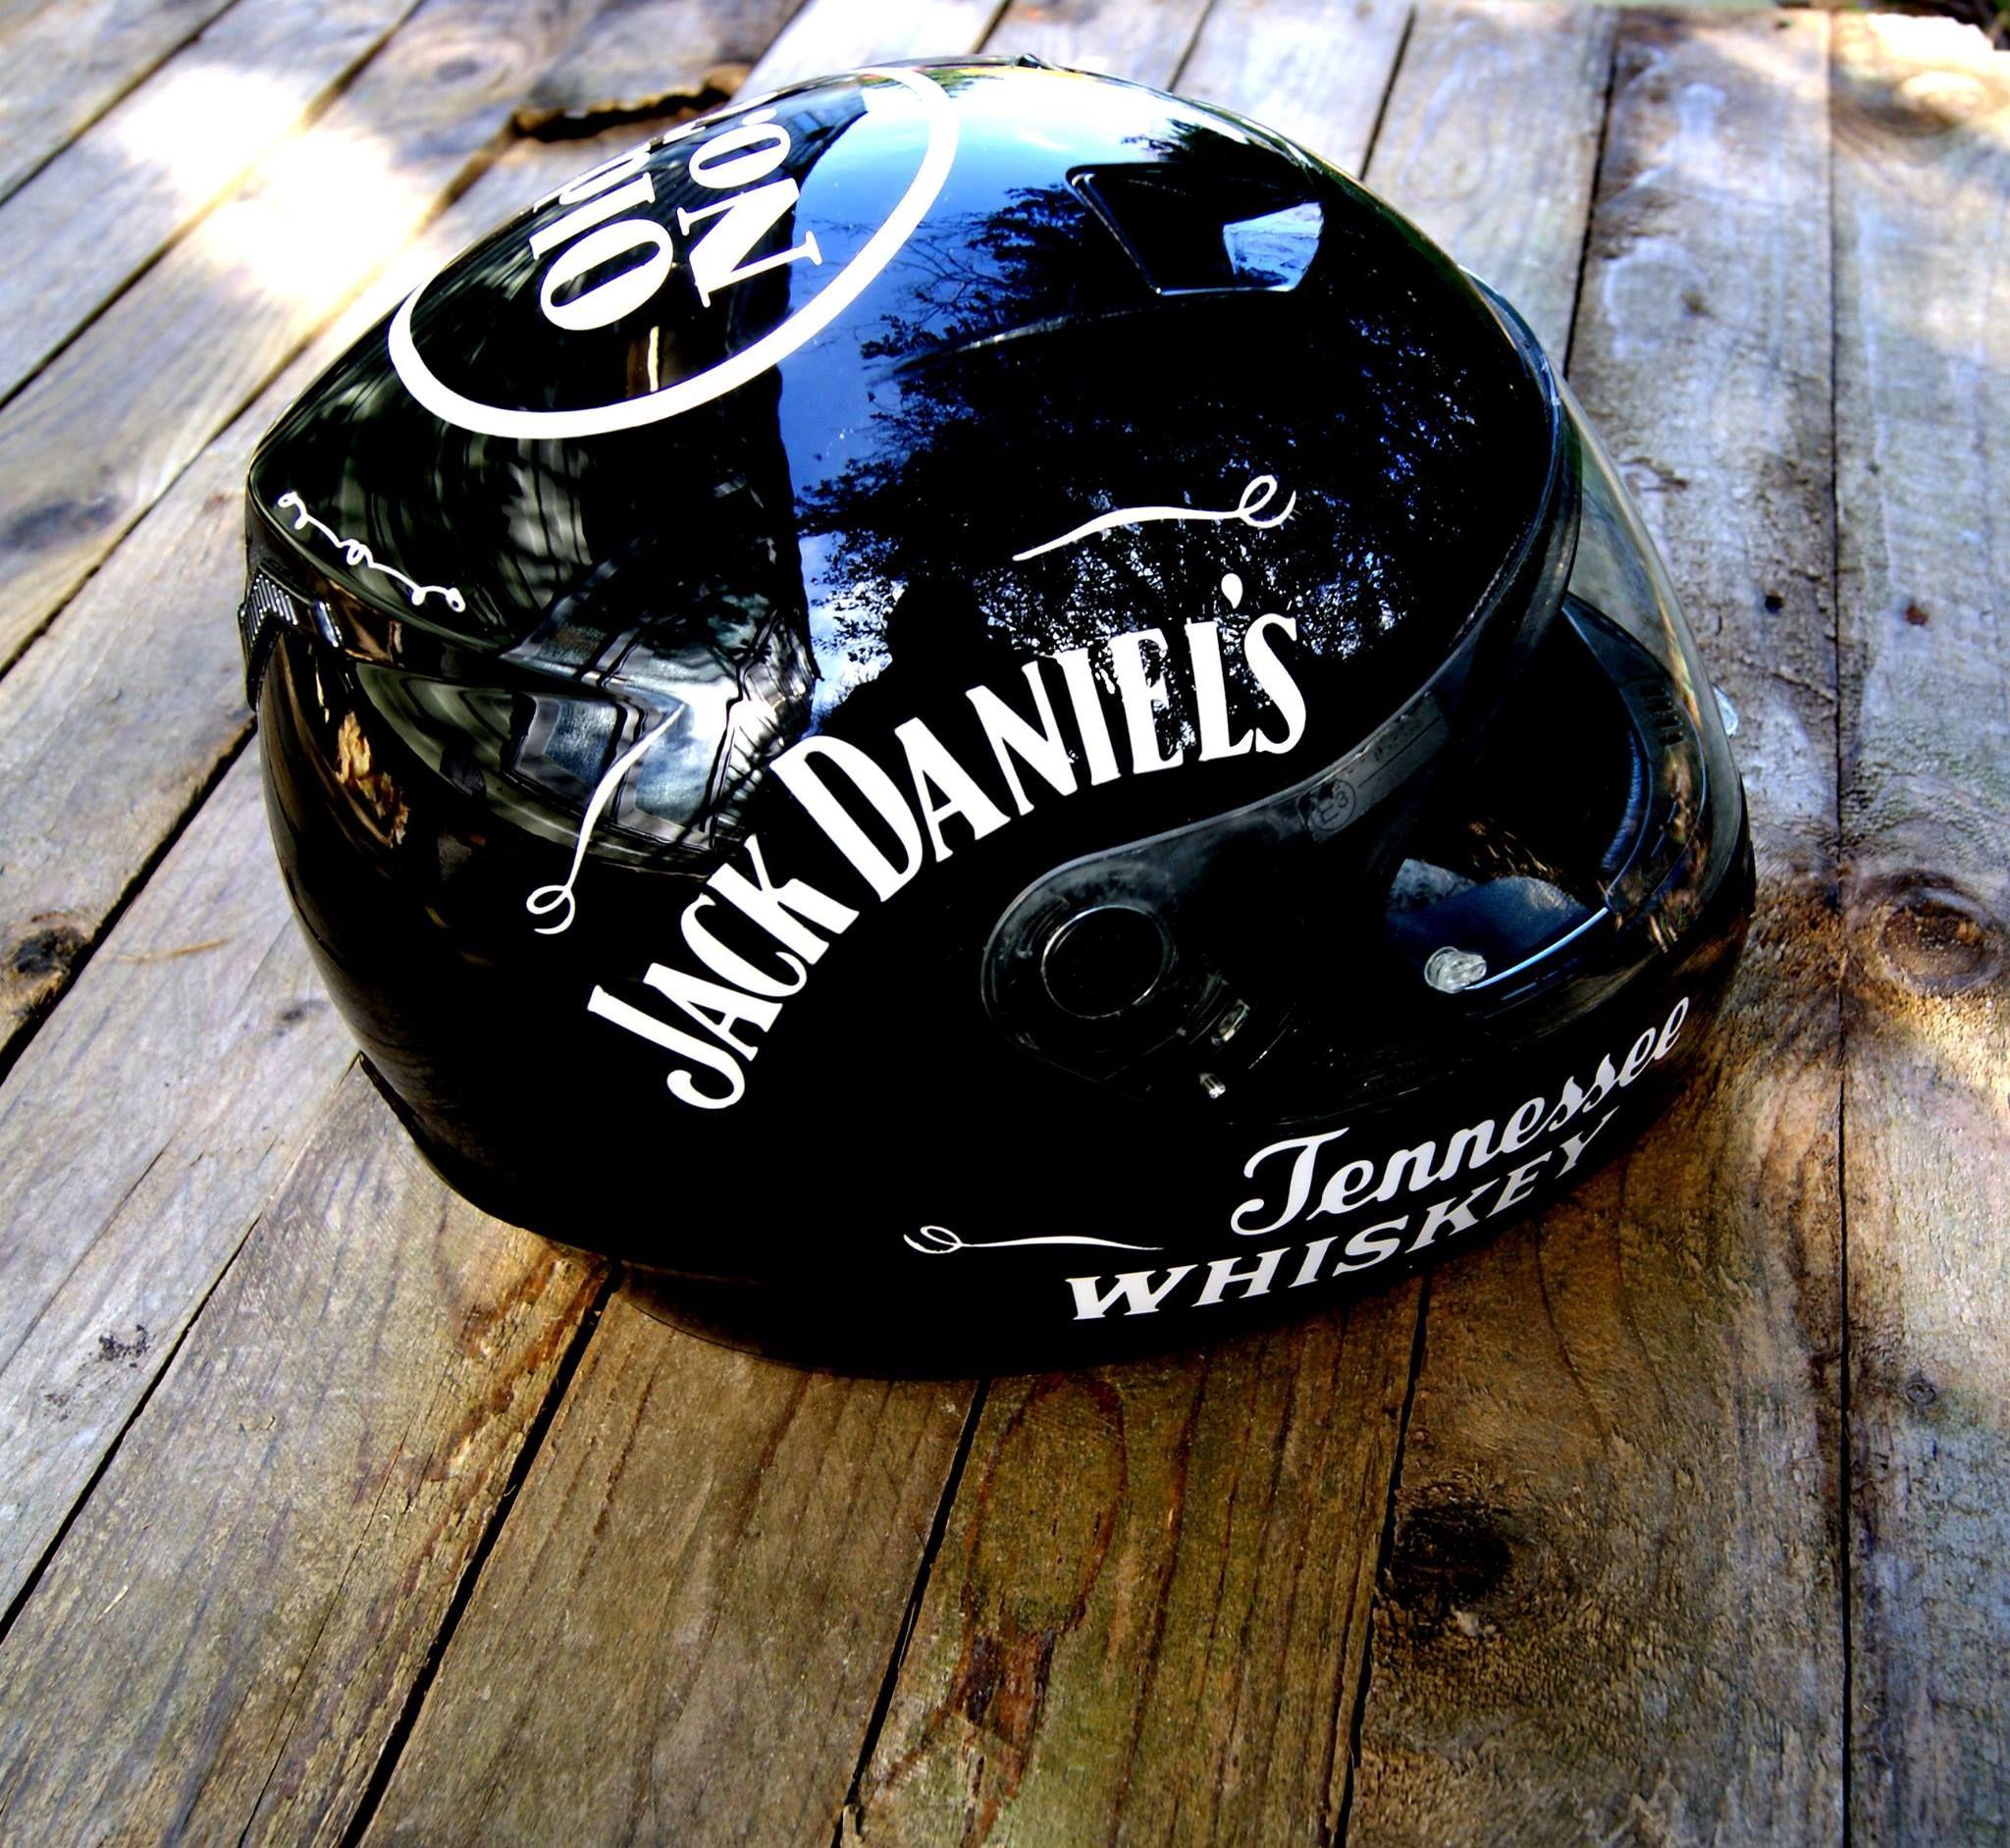 Pin By Gene Perez On Helmets Custom Motorcycle Helmets Helmet Concept Biker Helmets